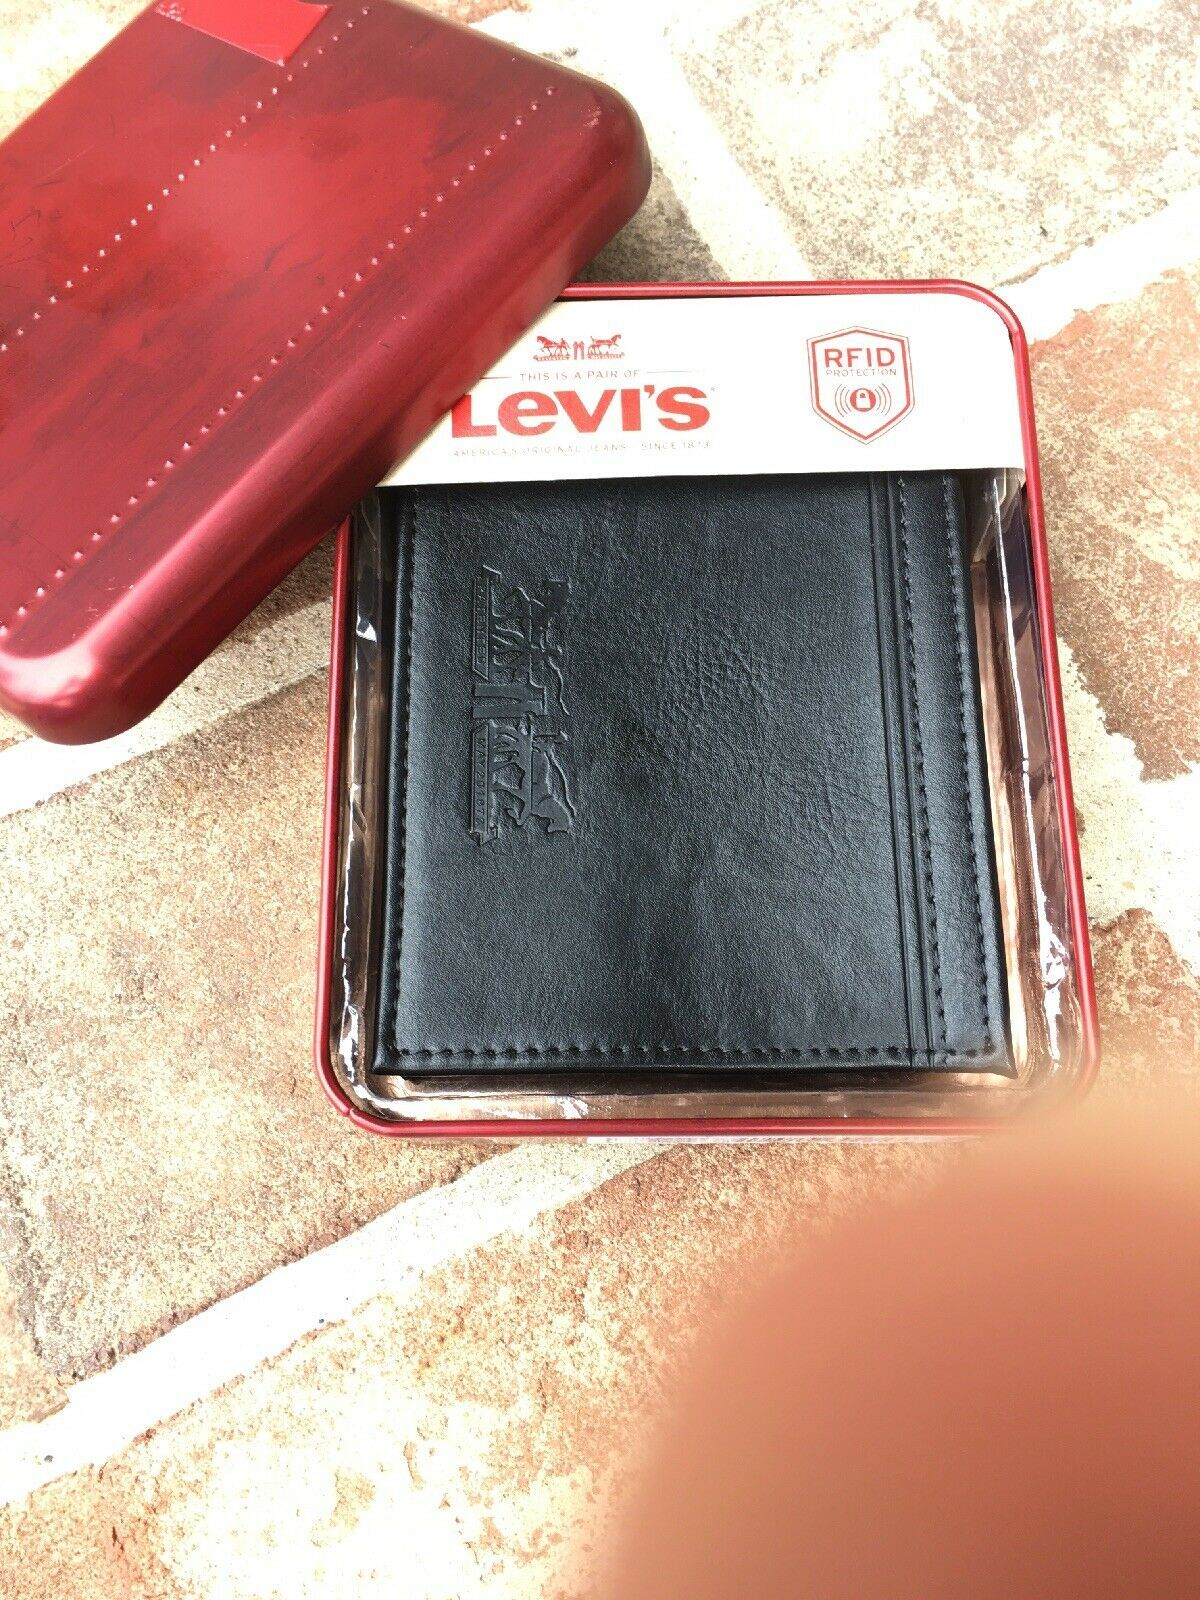 Levi's Men's Black Bifold Leather Wallet RFID Blocking image 7